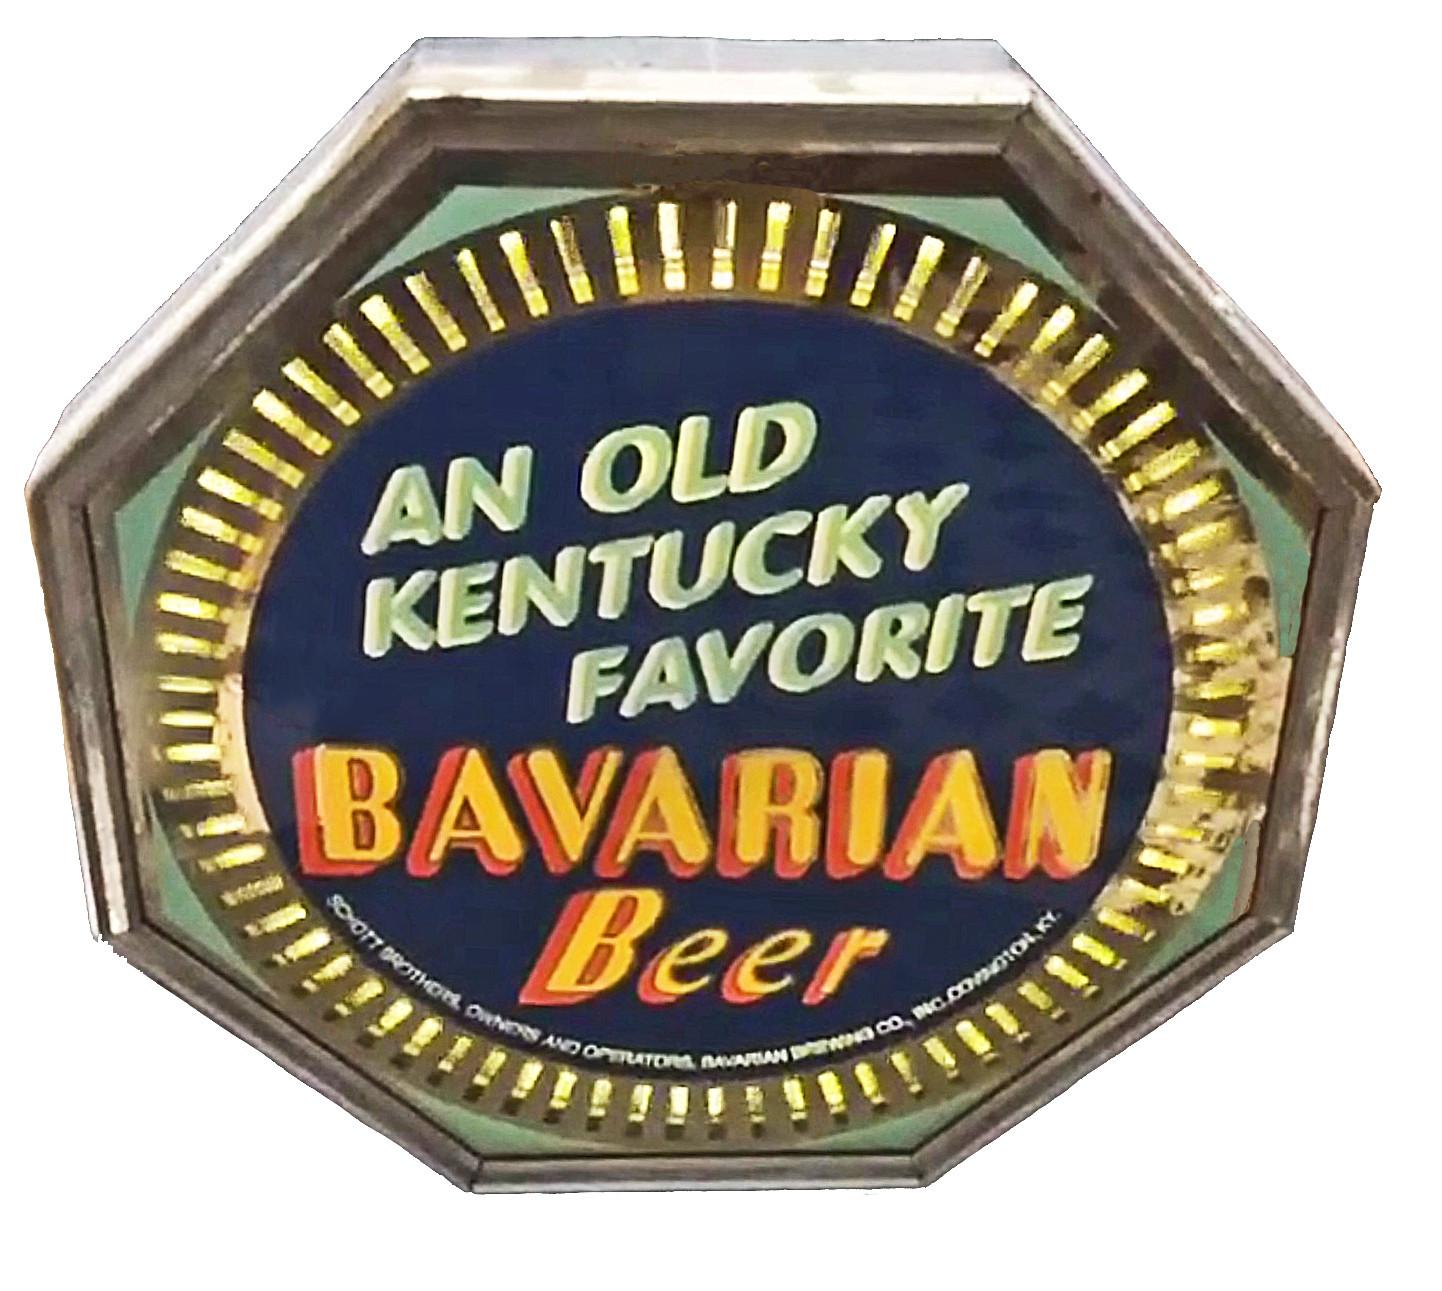 Bavarian Beer An Old KY Favorite Spinner Neon Sign, Covington, KY.